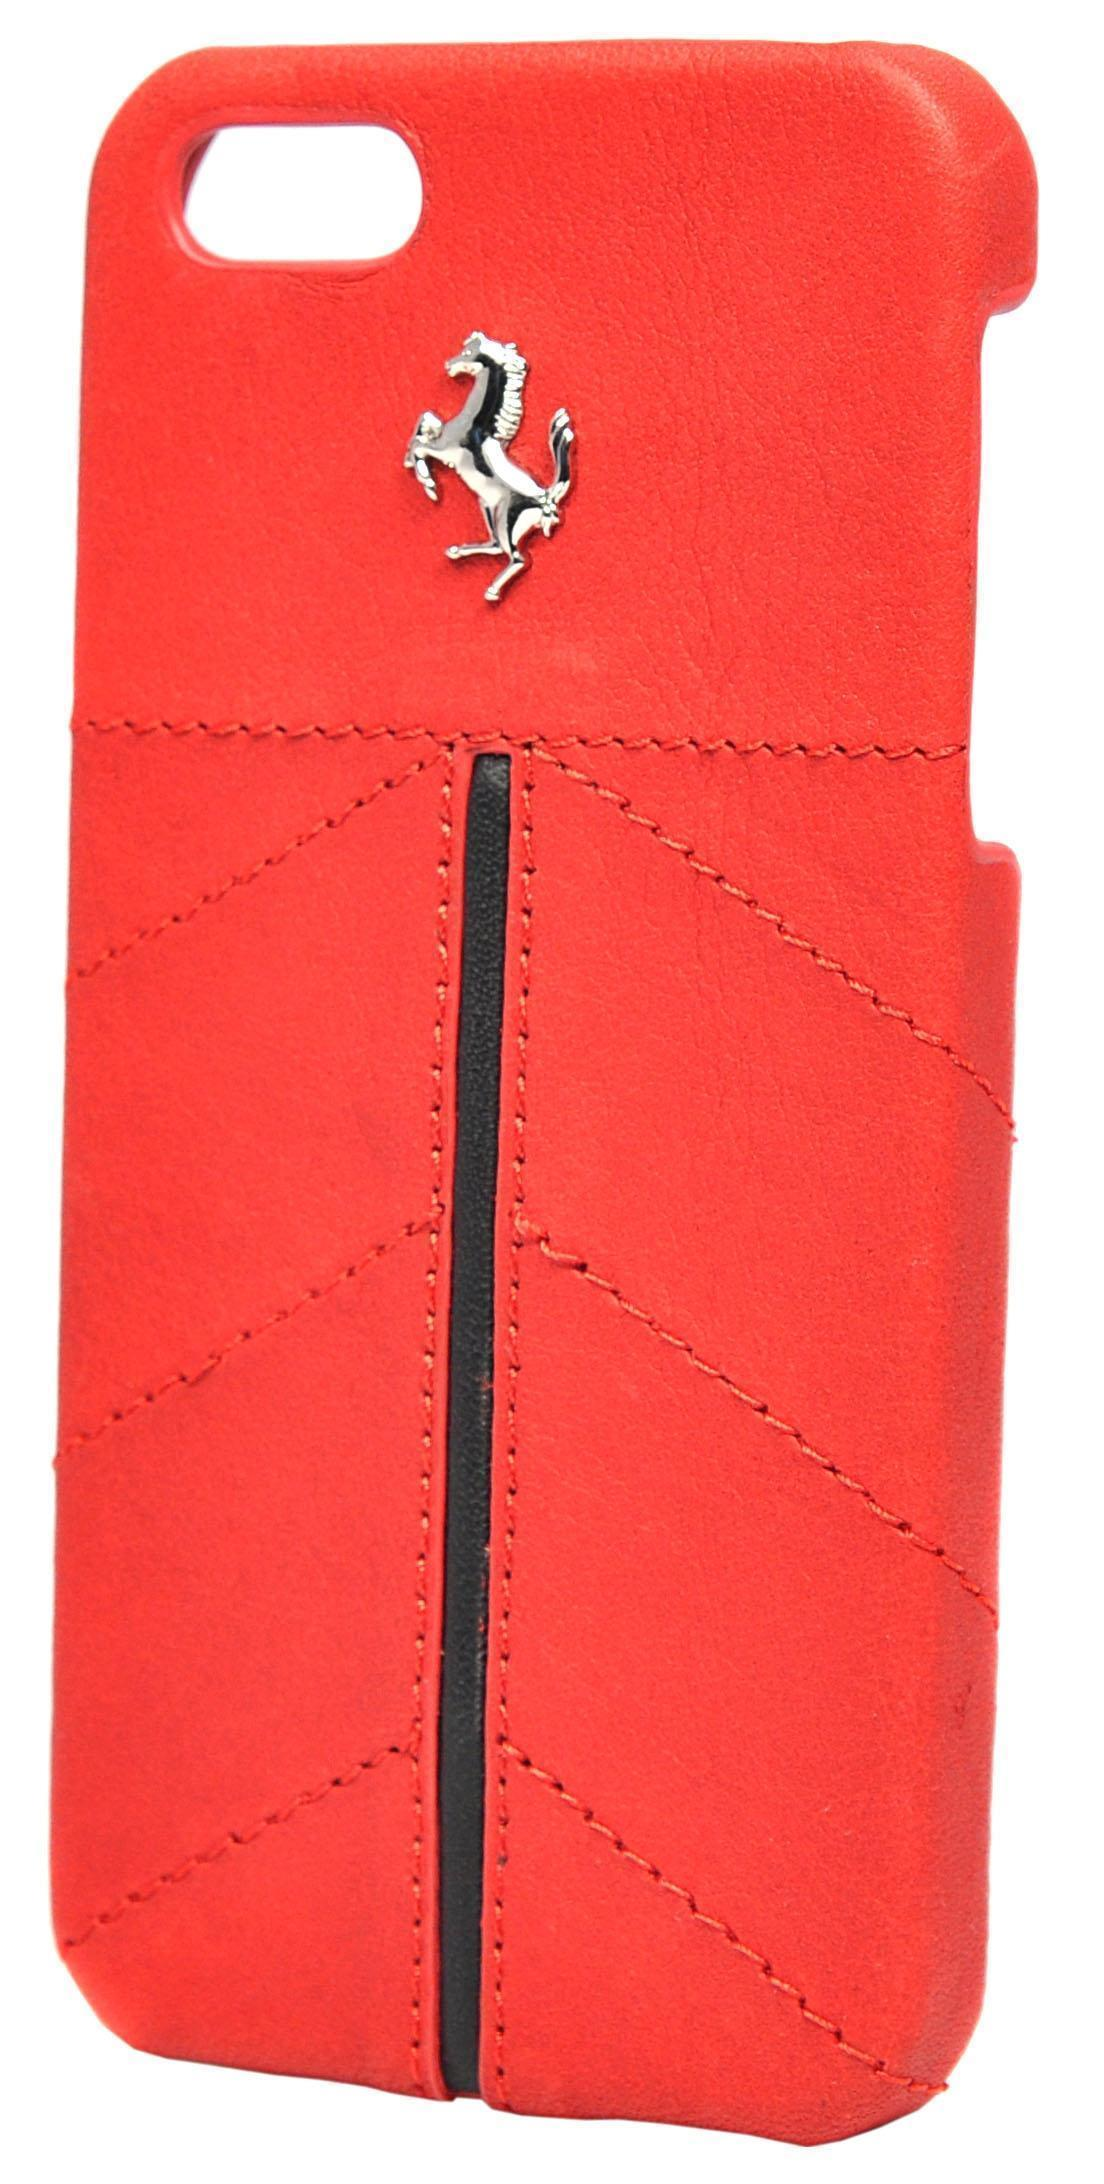 Чехол-накладка Ferrari California Hard для Apple iPhone SE/5S/5 Redдля iPhone 5/5S/SE<br>Чехол-накладка Ferrari California Hard для Apple iPhone SE/5S/5 Red<br>